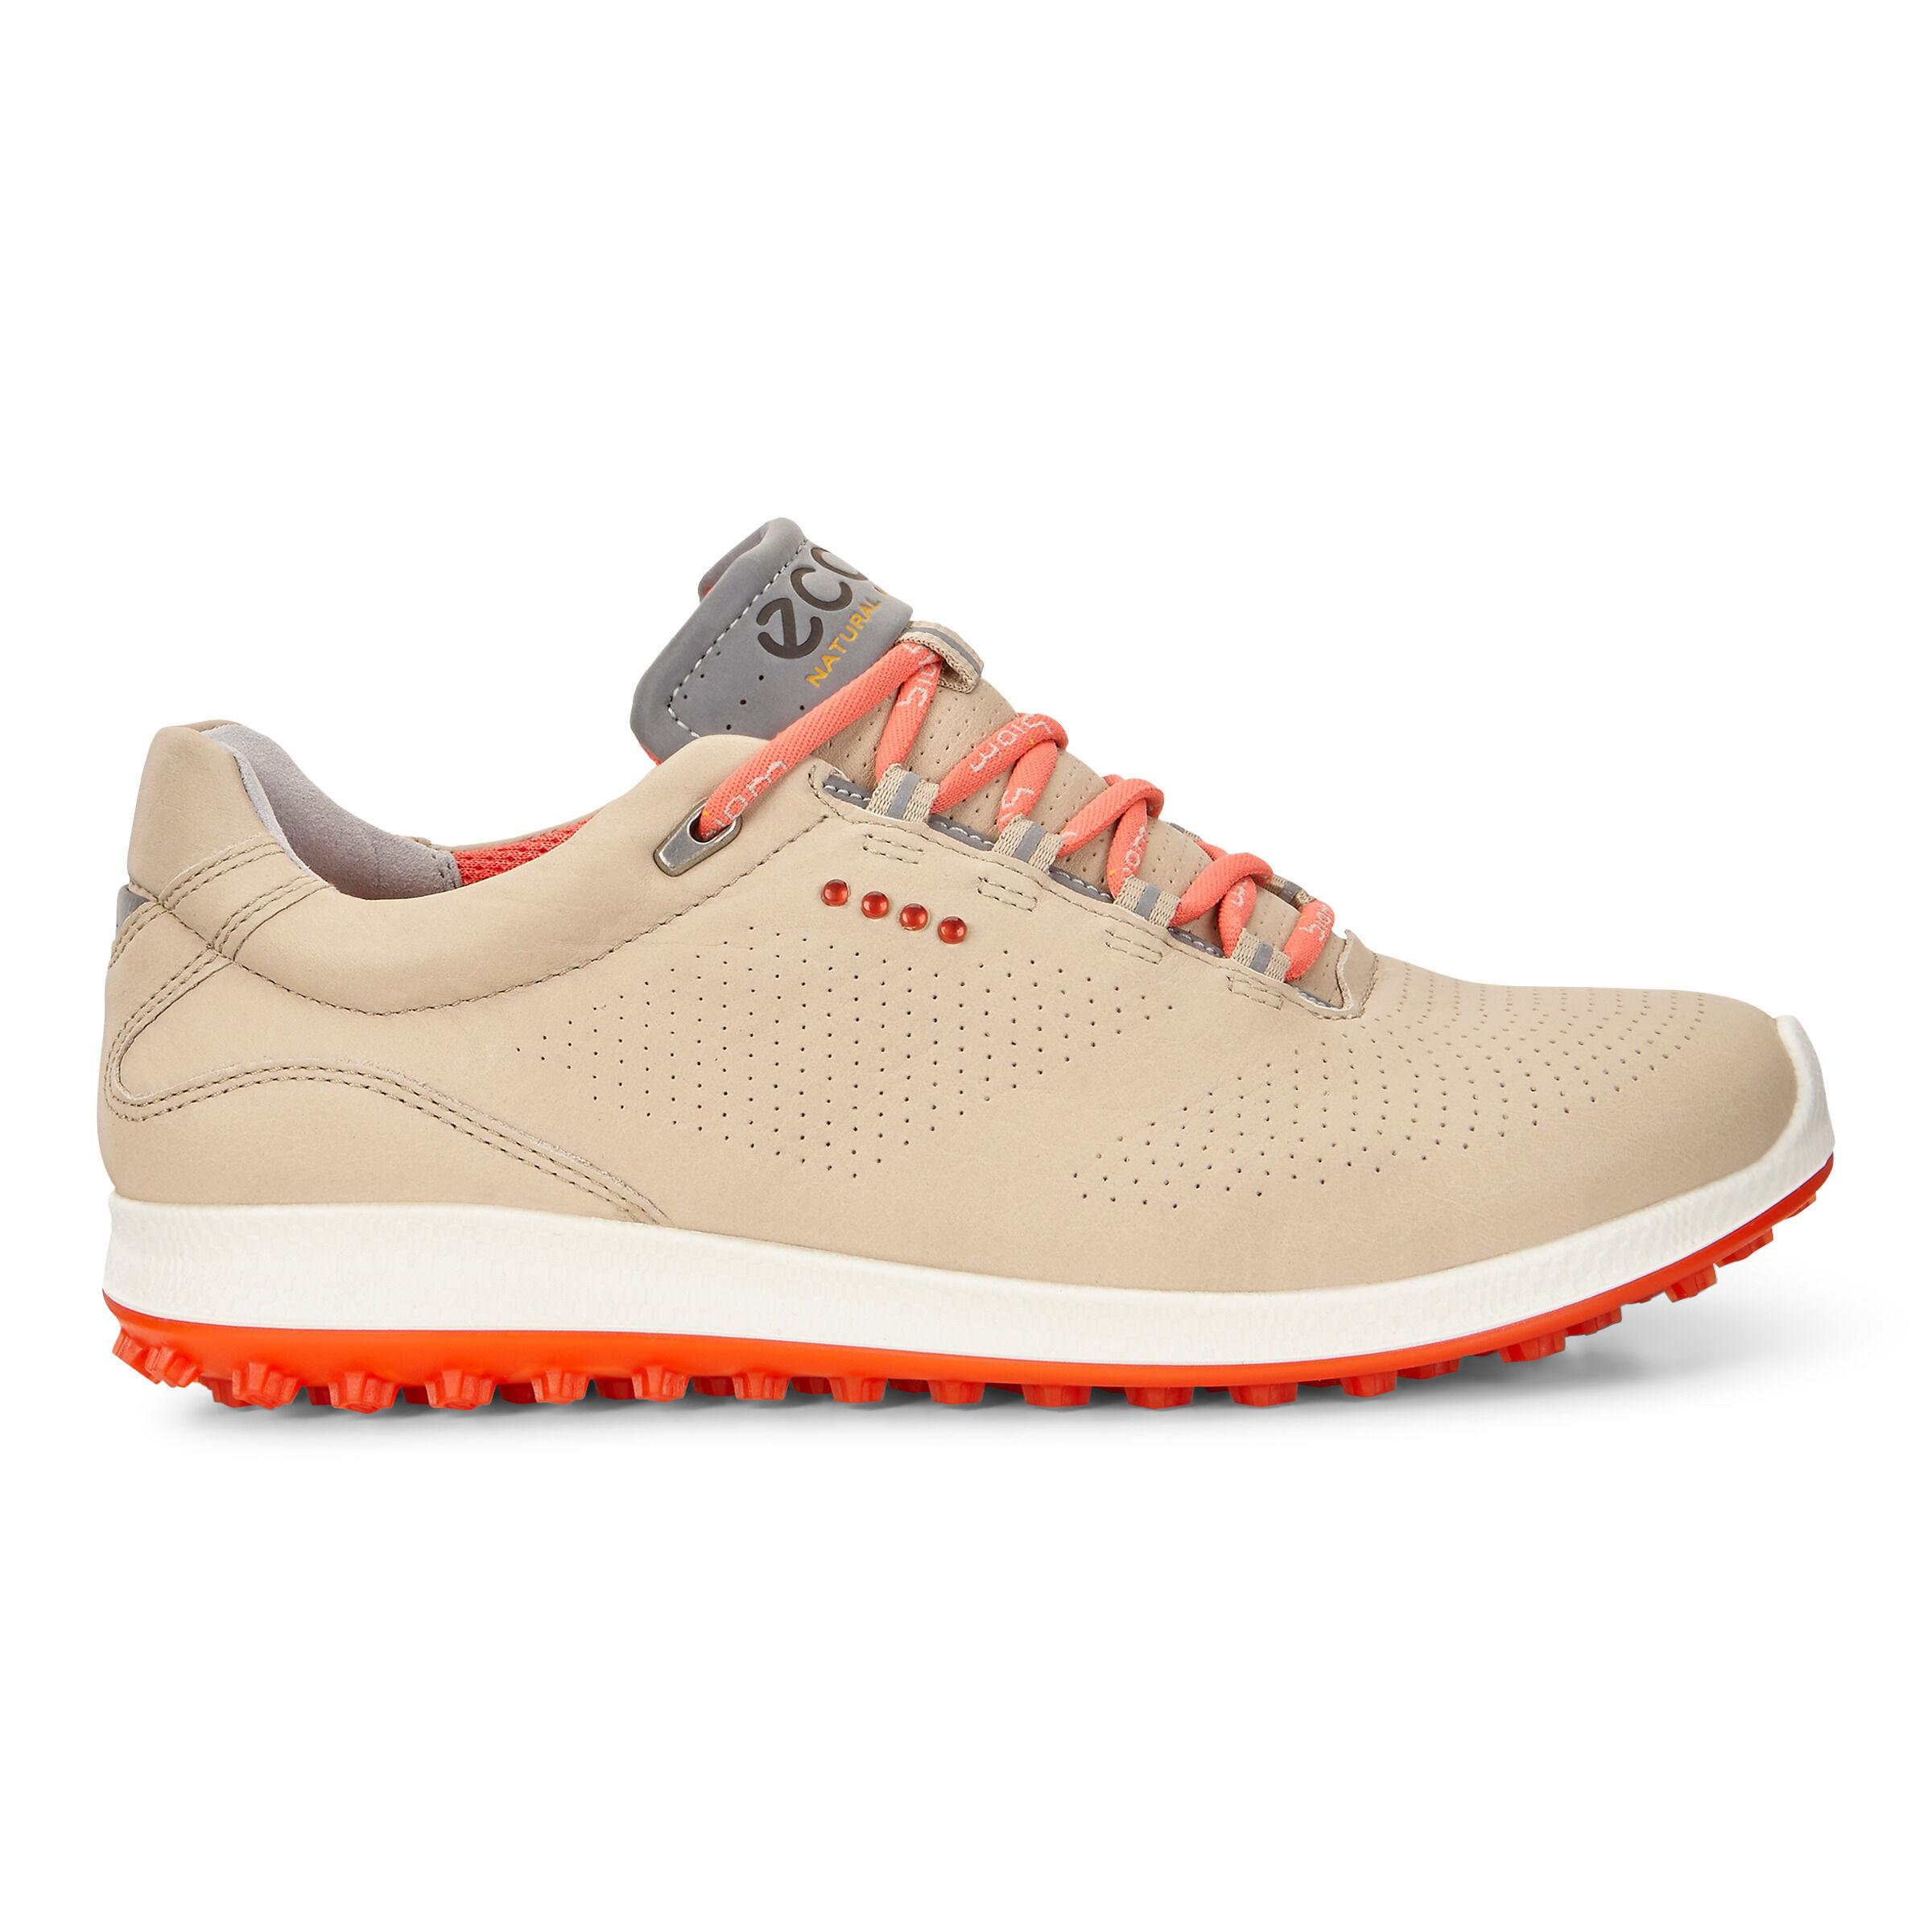 ecco womens shoes sale